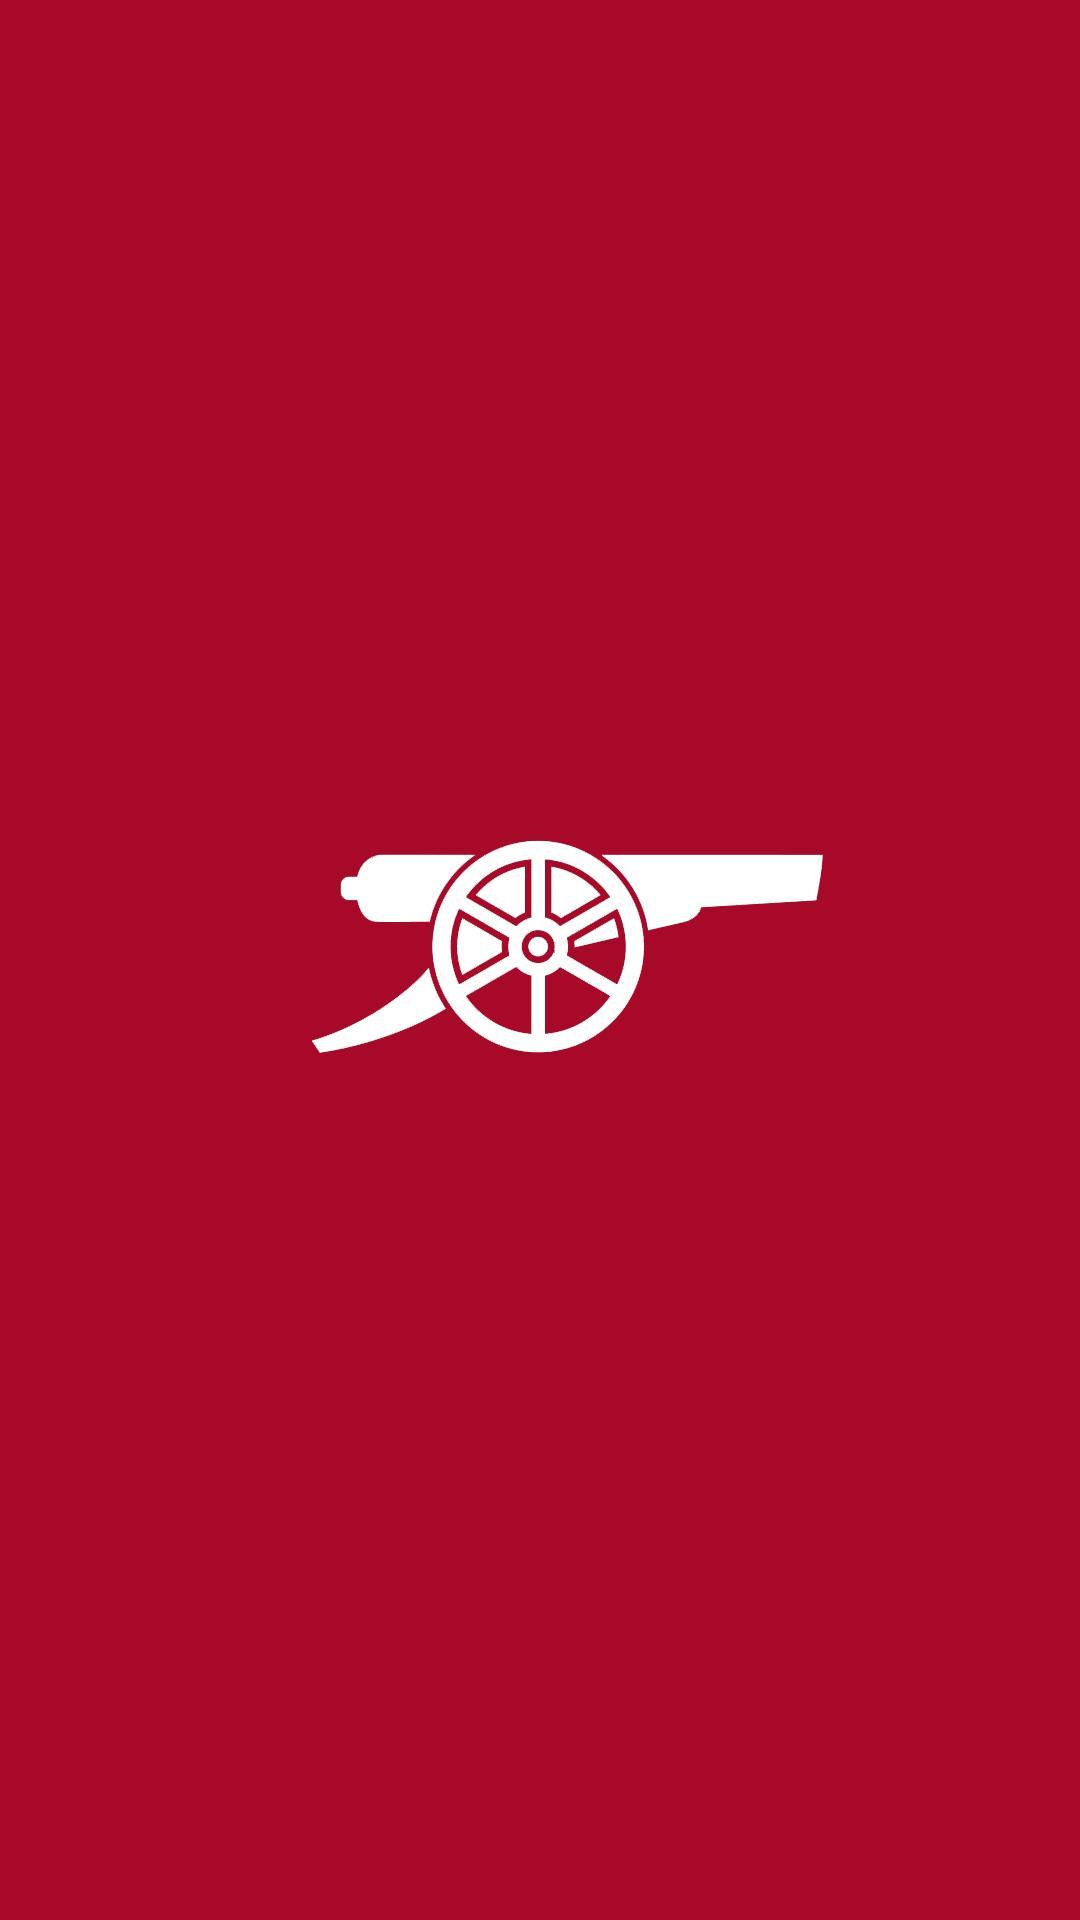 Arsenal F C 1080x1920 Wallpaper Teahub Io